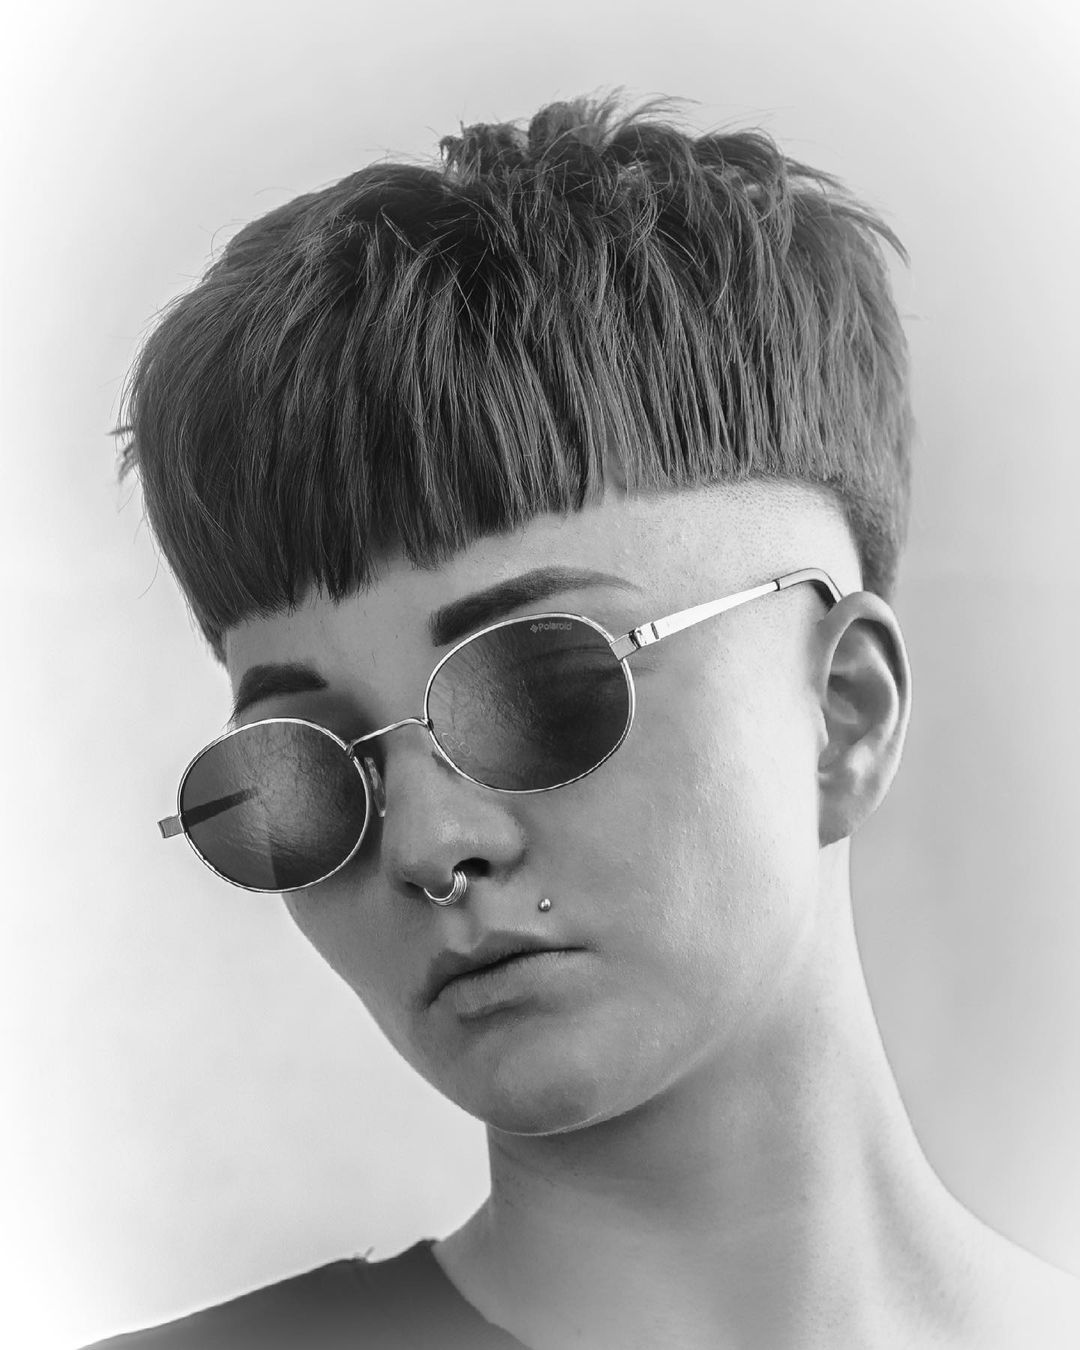 fryzura na pieczarkę męska